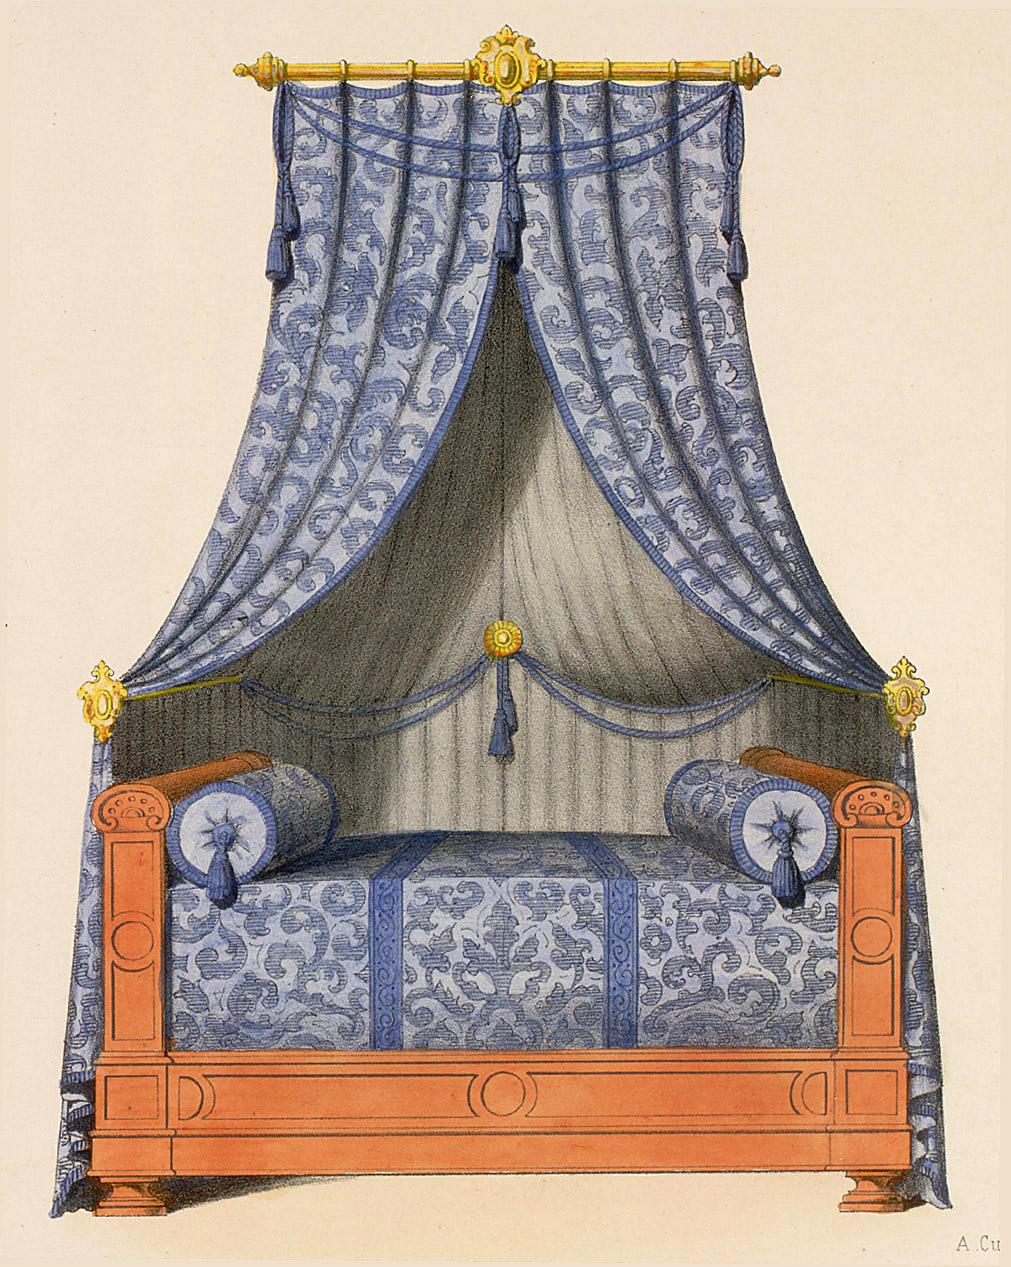 Beds (furniture),  Image number:SIL12-2-035c